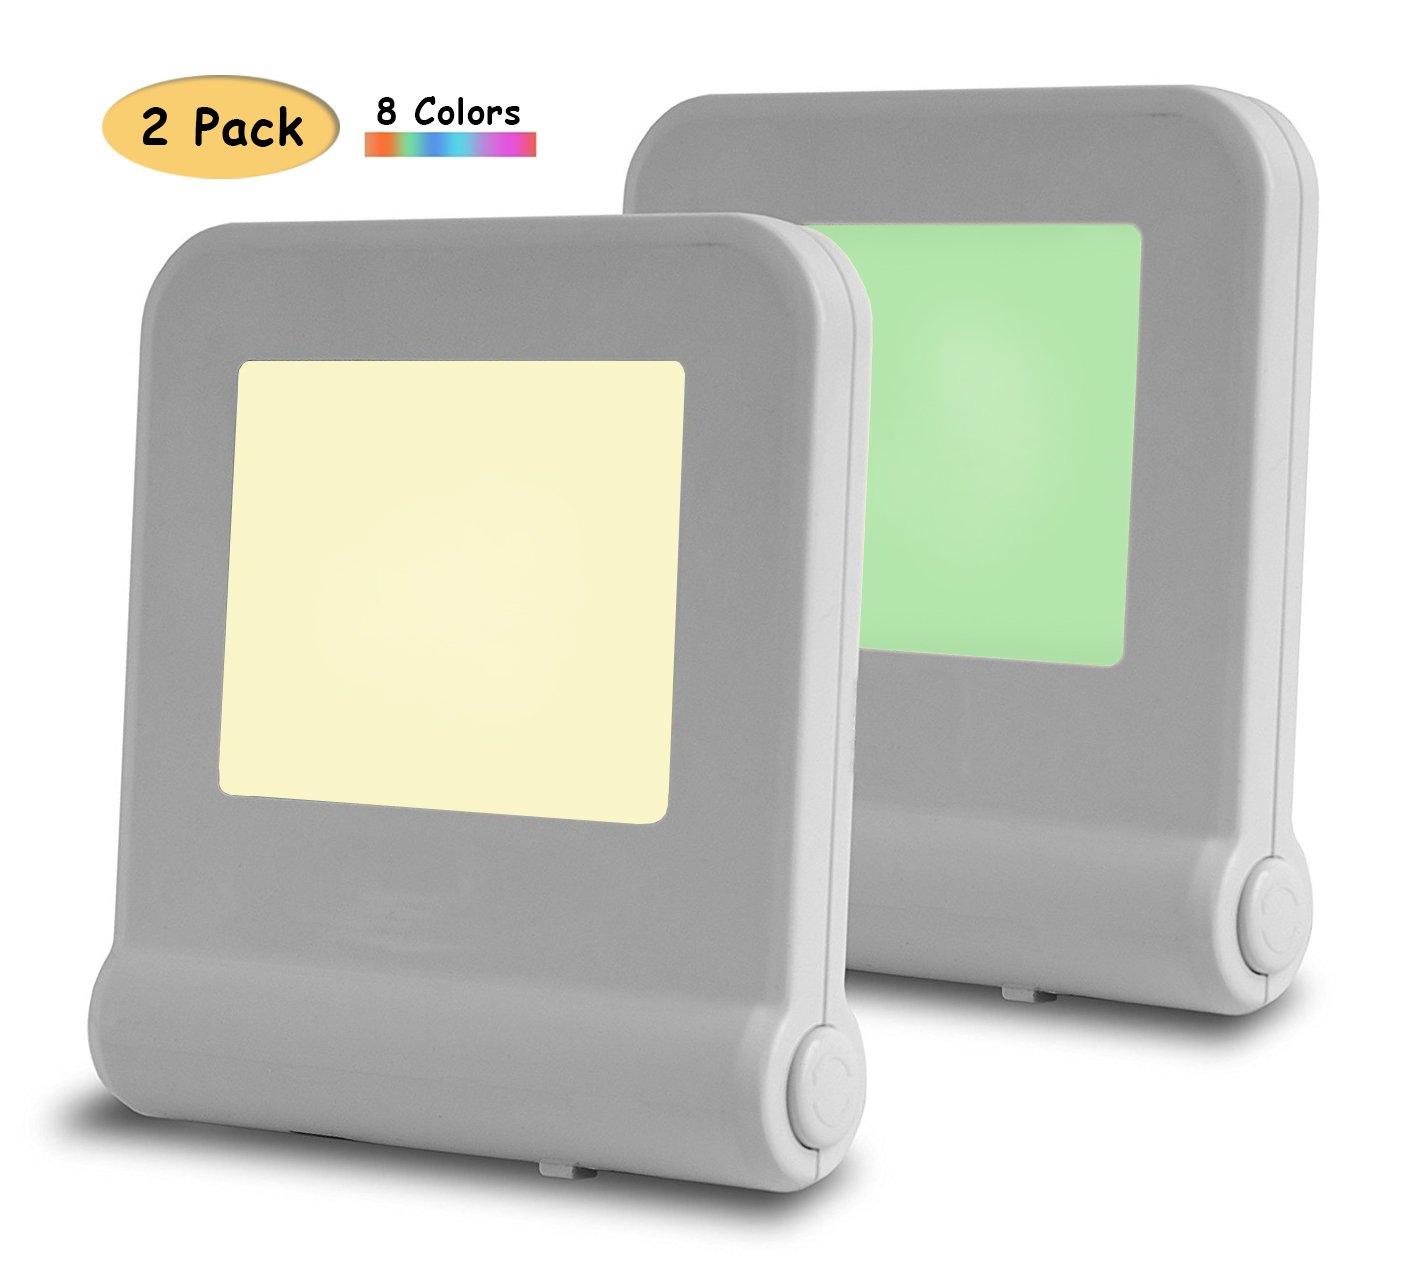 Plug In LED Night Light withスマートDusk to Dawnセンサー、8色ナイトランプ、エネルギーの効率的な夜ランプベッドルーム、ベビールーム、赤ちゃん保育園、キッチン、廊下、階段、バスルーム、廊下夜ライト B07DJ5V1MS 14961